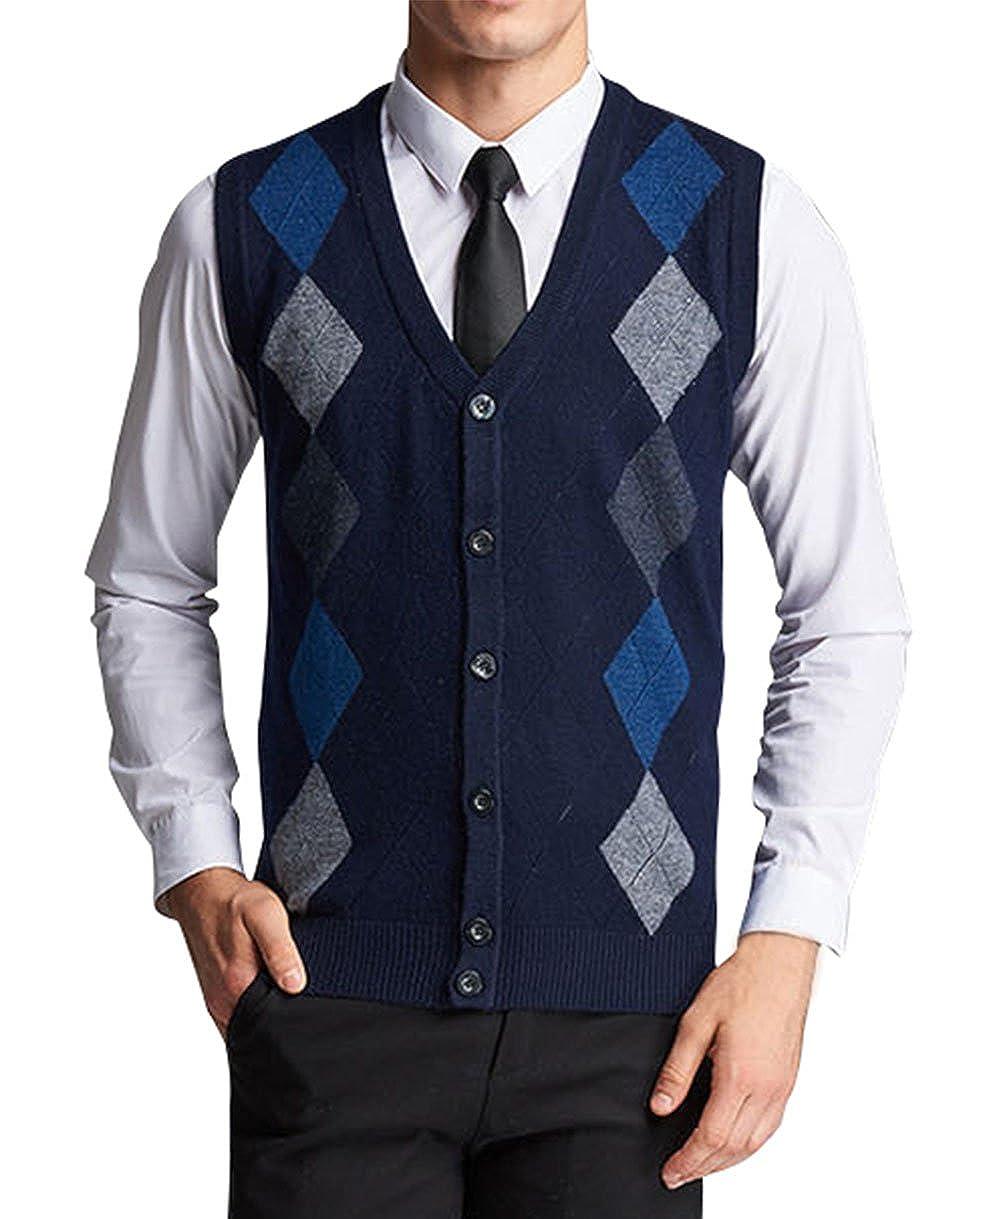 Lyamazing Men's V-Neck Argyle Pattern Button Down Sweater Vest Cardigan